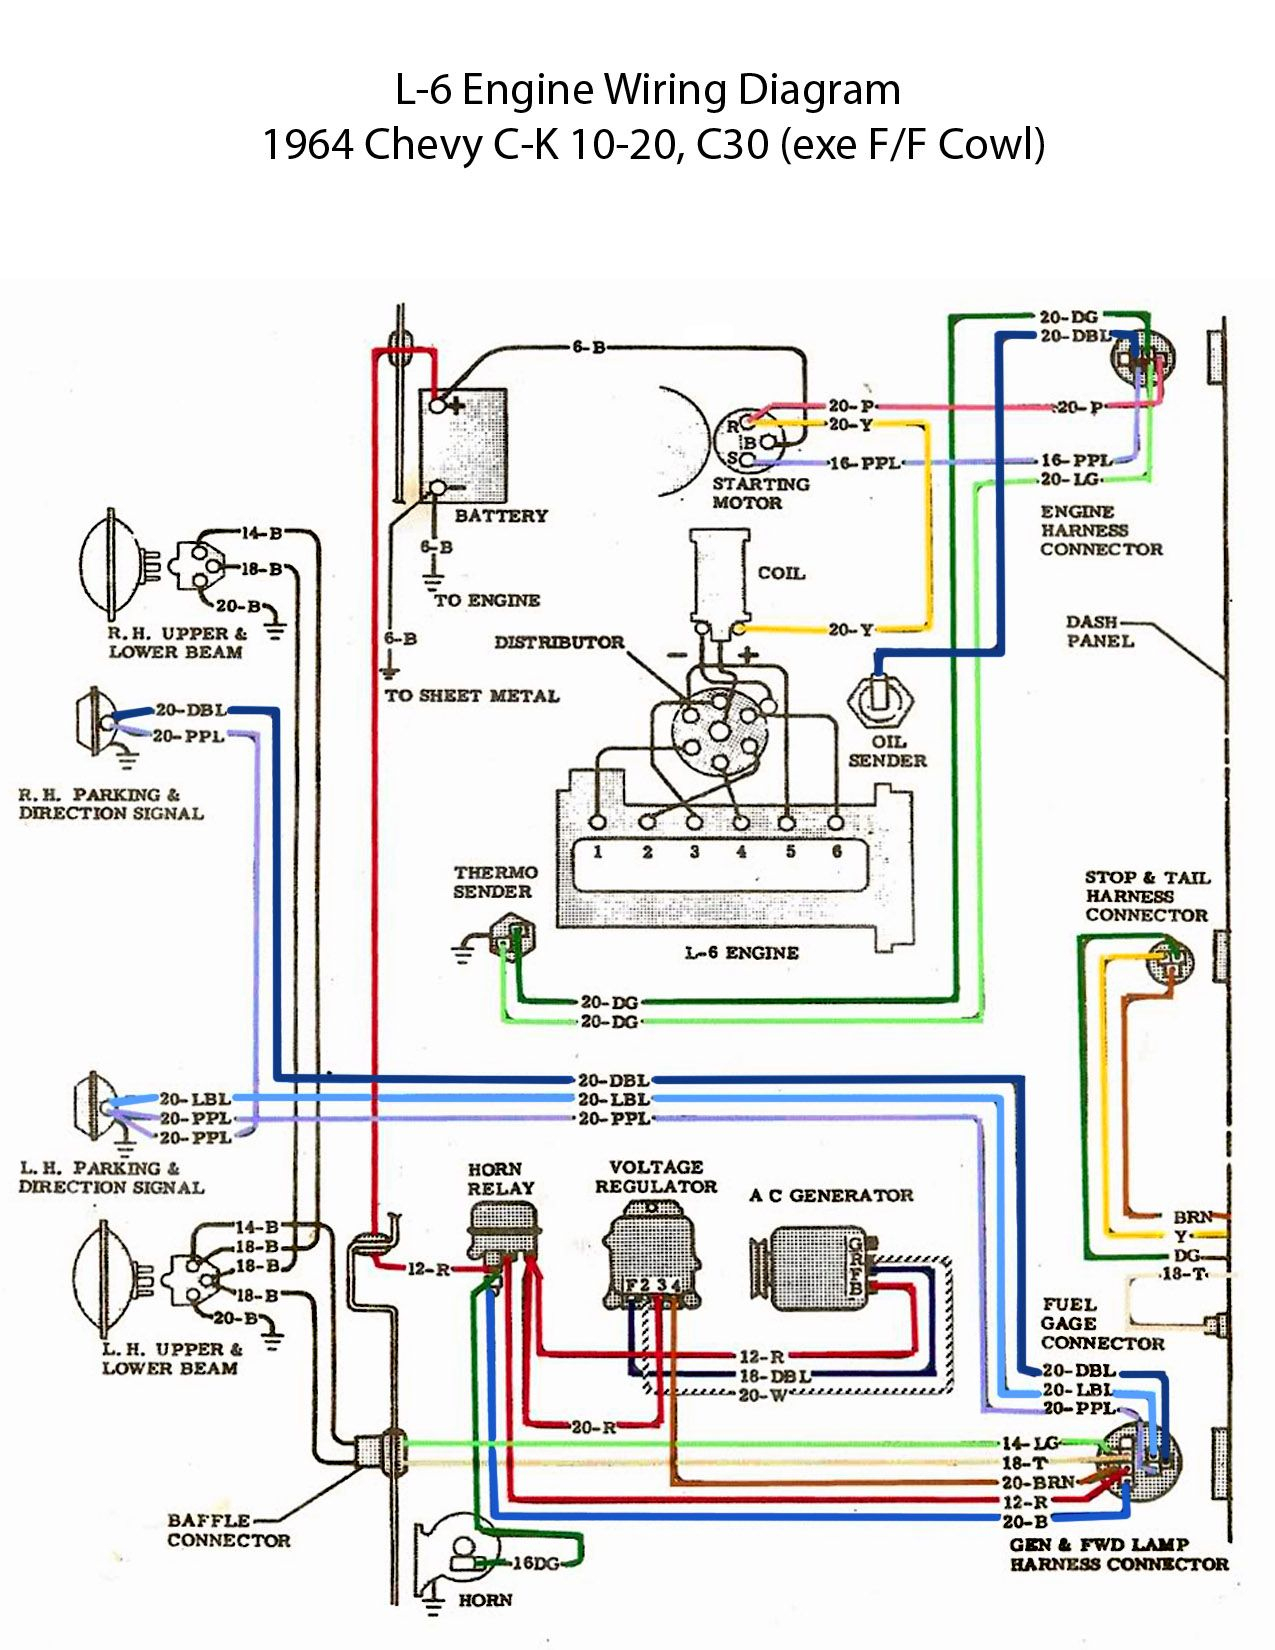 Easy Street Air Ride Wiring Diagram - Wiring Diagrams Hubs - Air Compressor Wiring Diagram